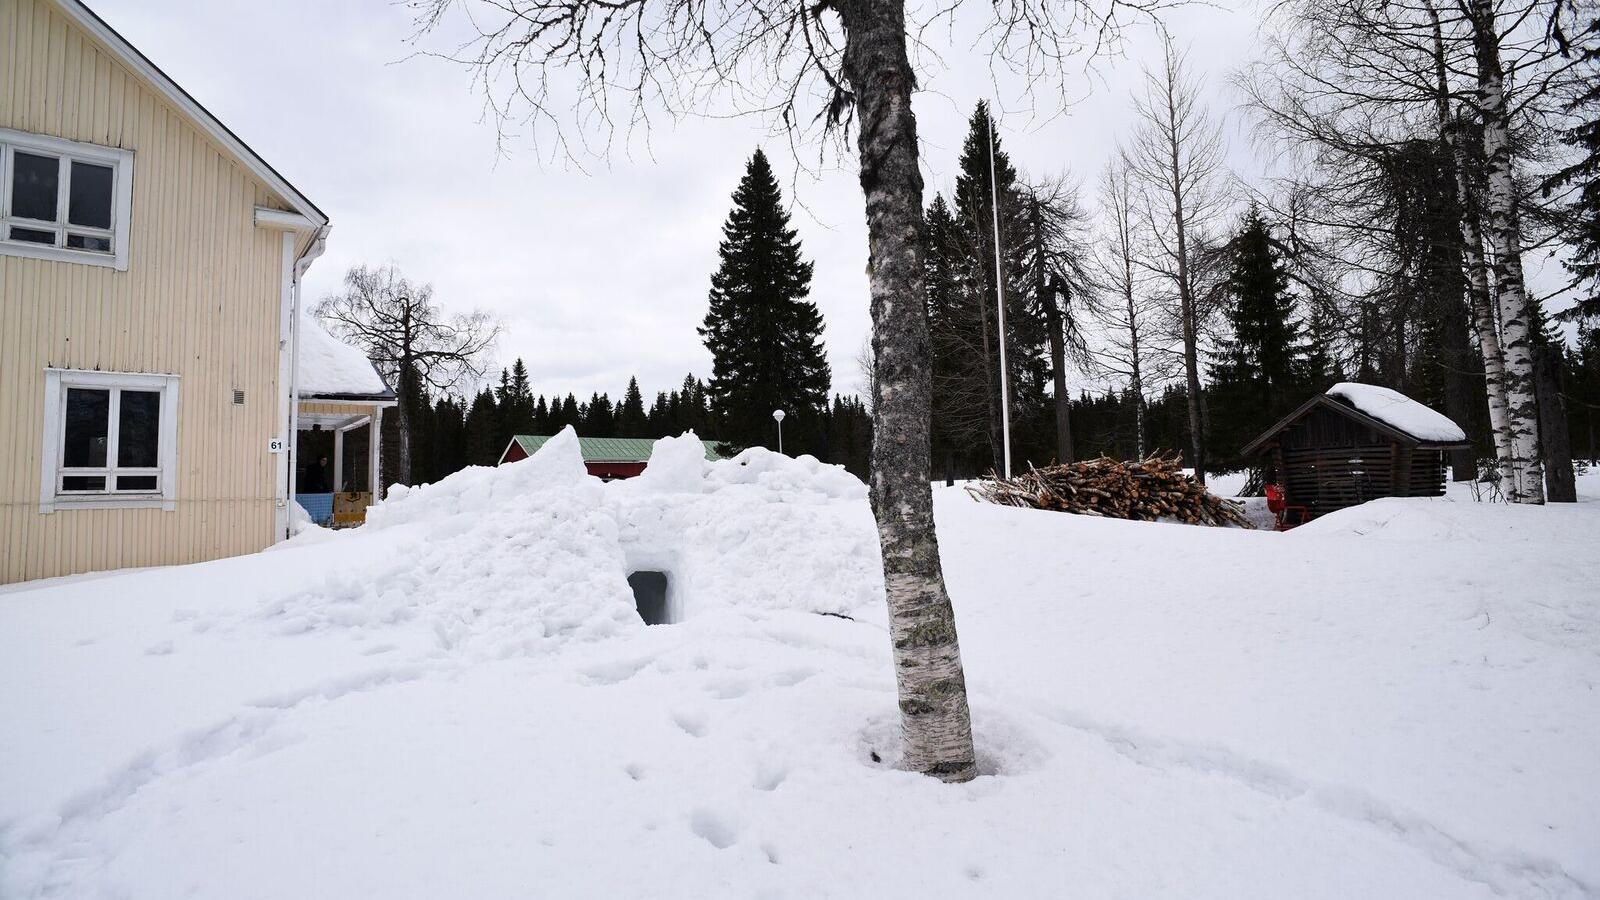 Survival Snow Cave_02 (1).jpg